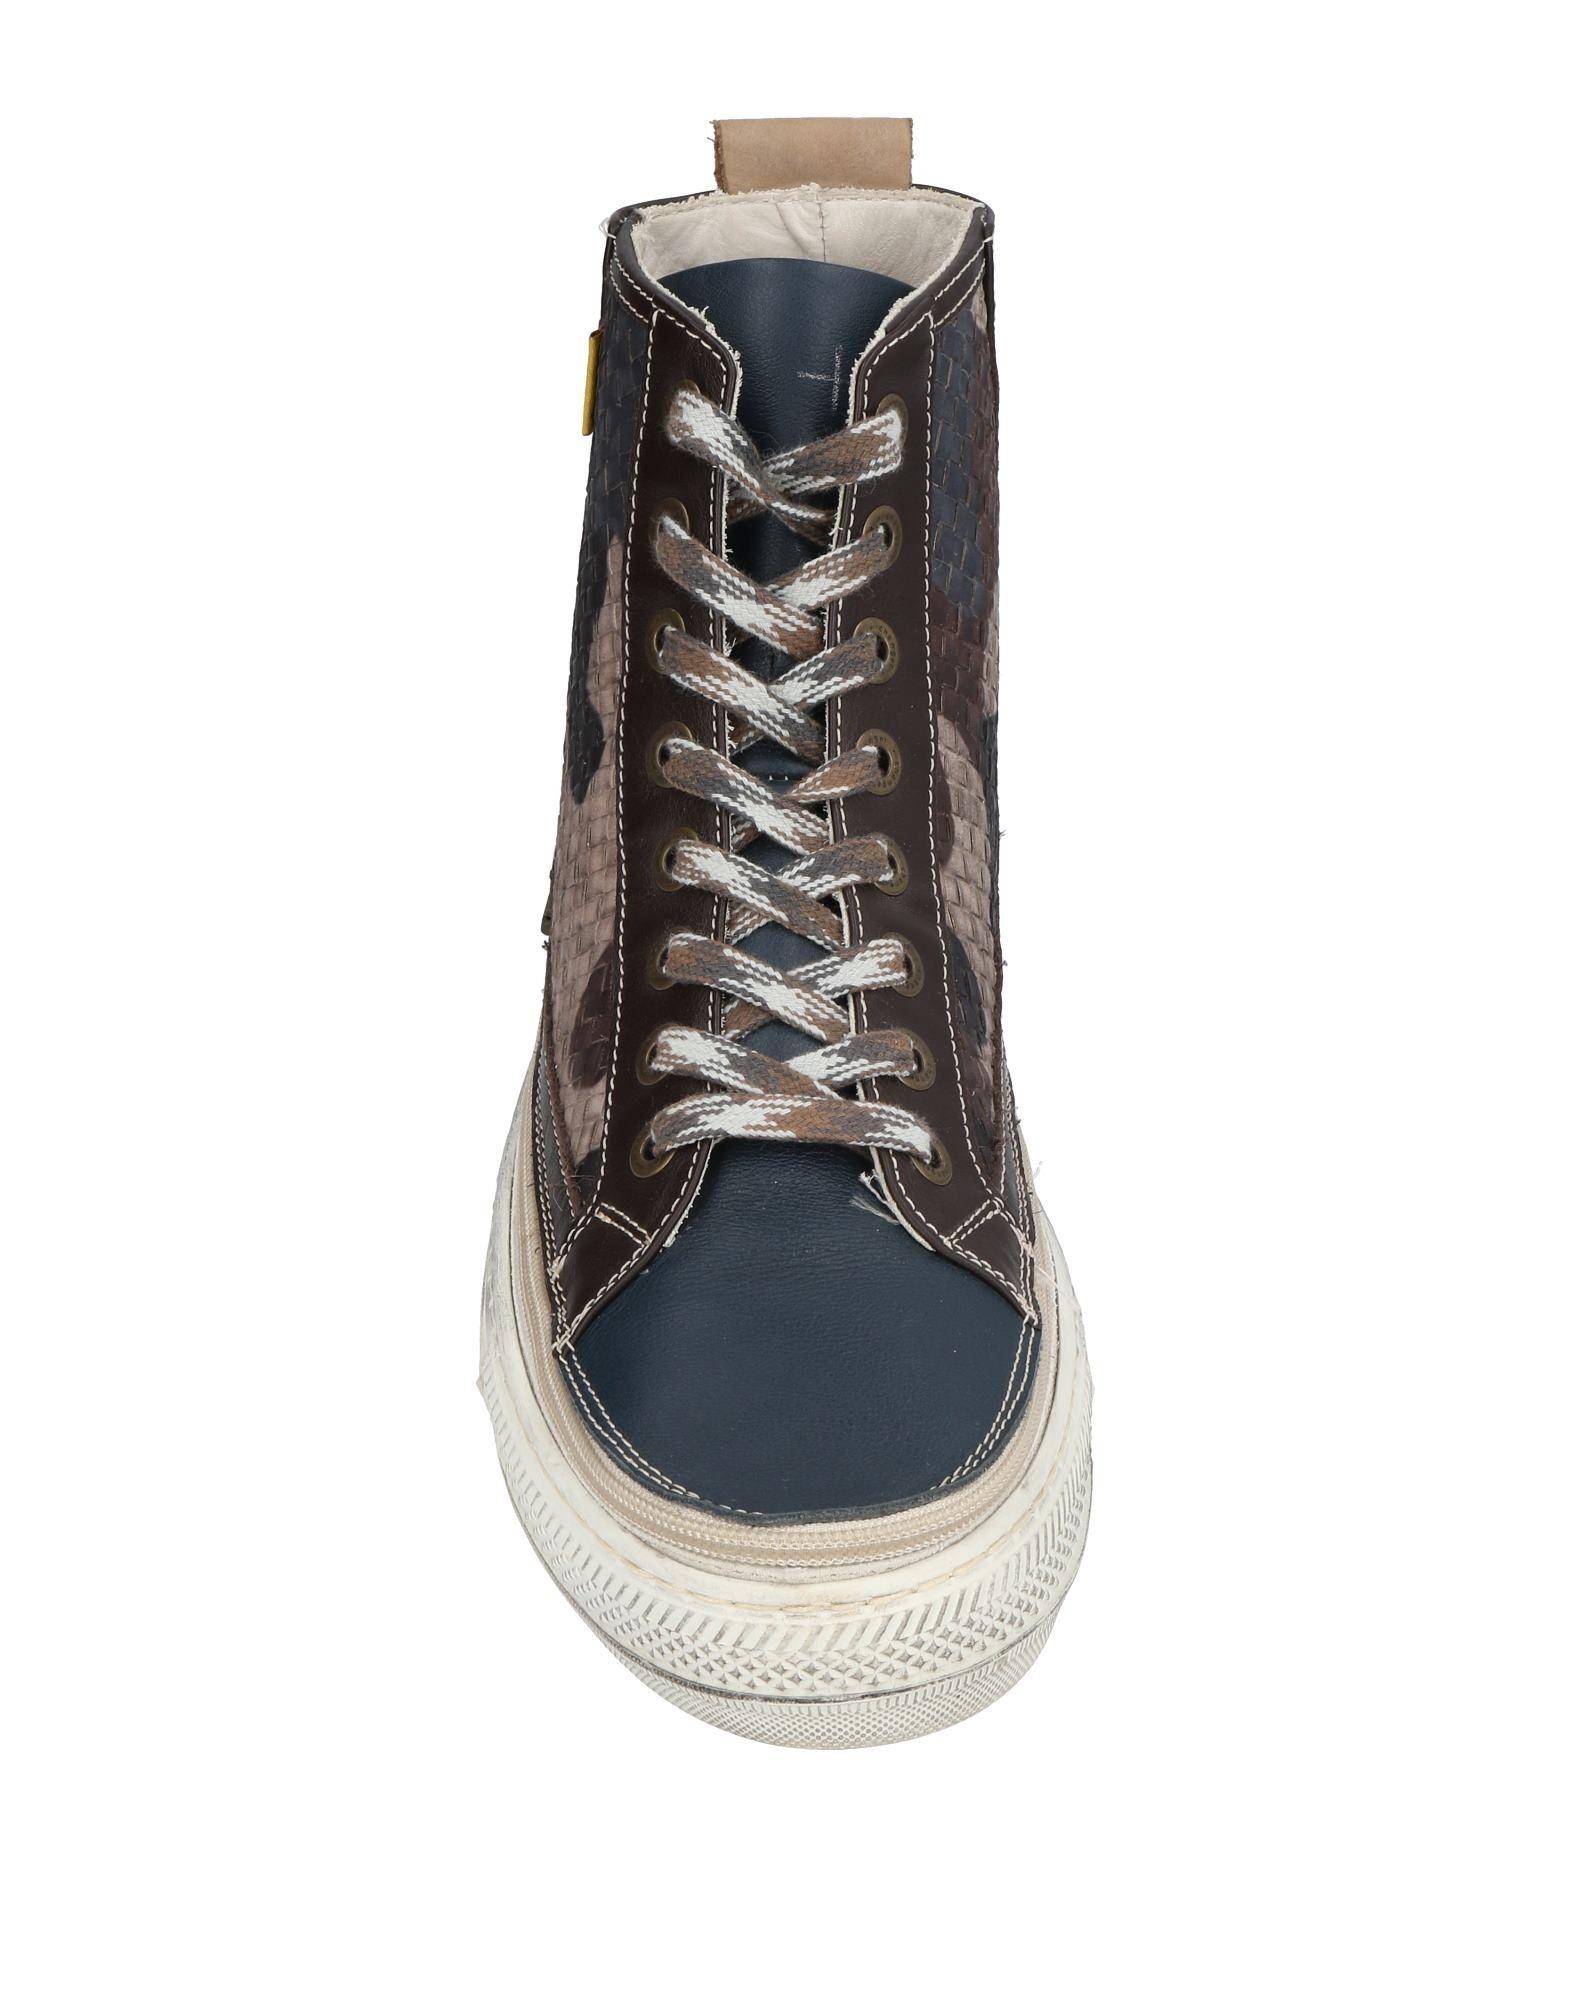 Moda Sneakers Change Uomo - 11460261NO